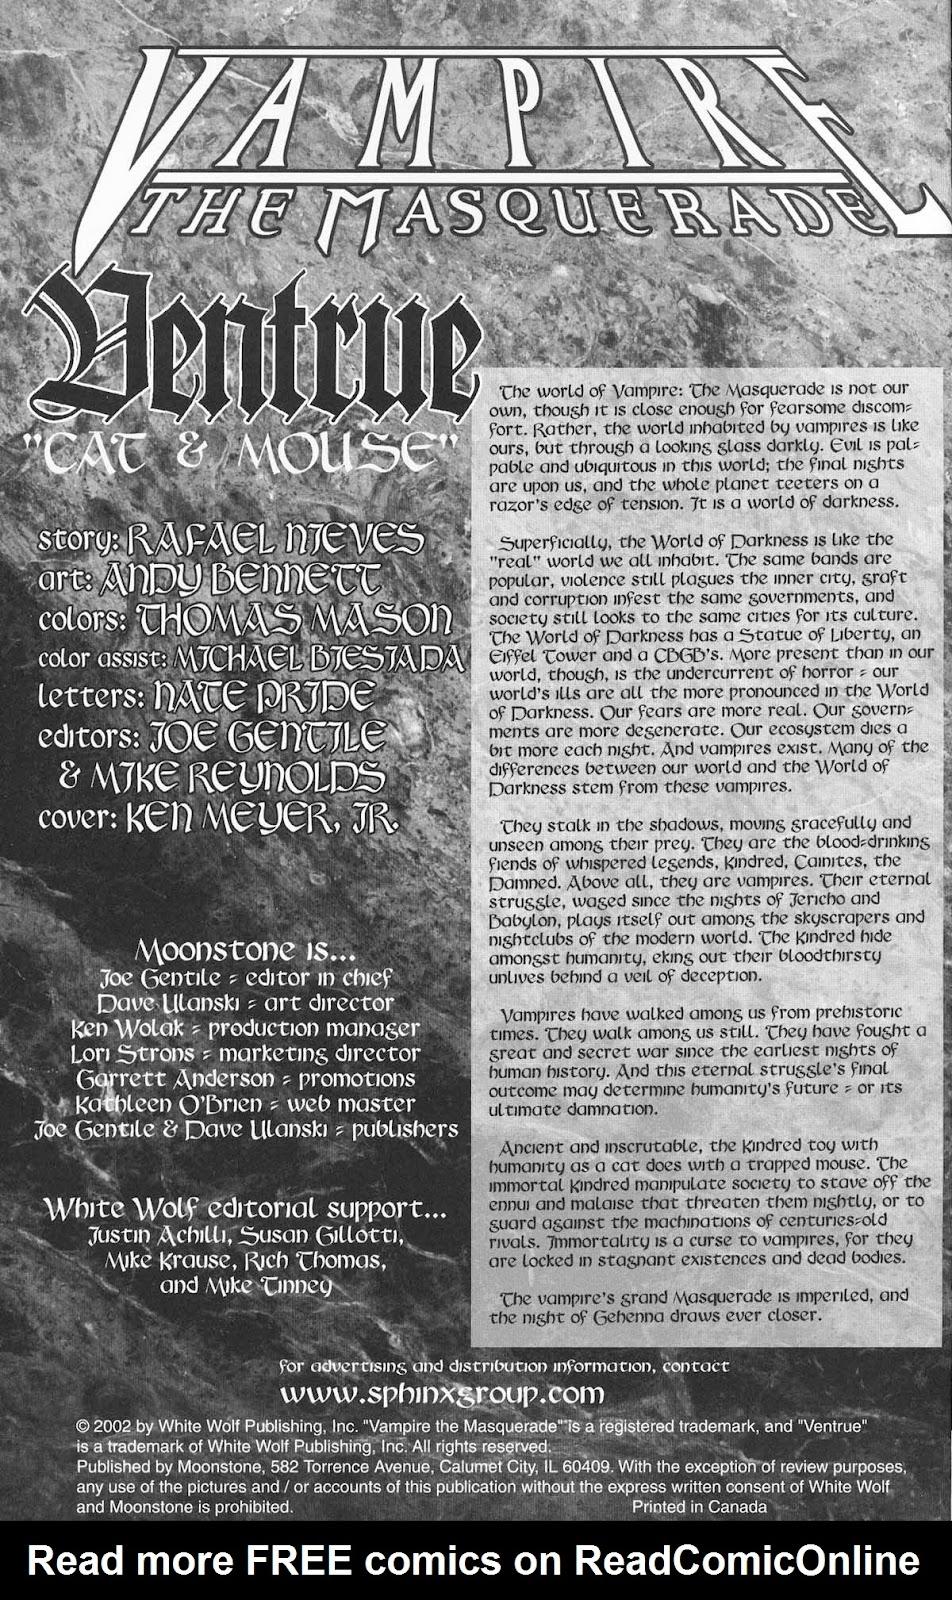 Read online Vampire the Masquerade comic -  Issue # Ventrue - 2